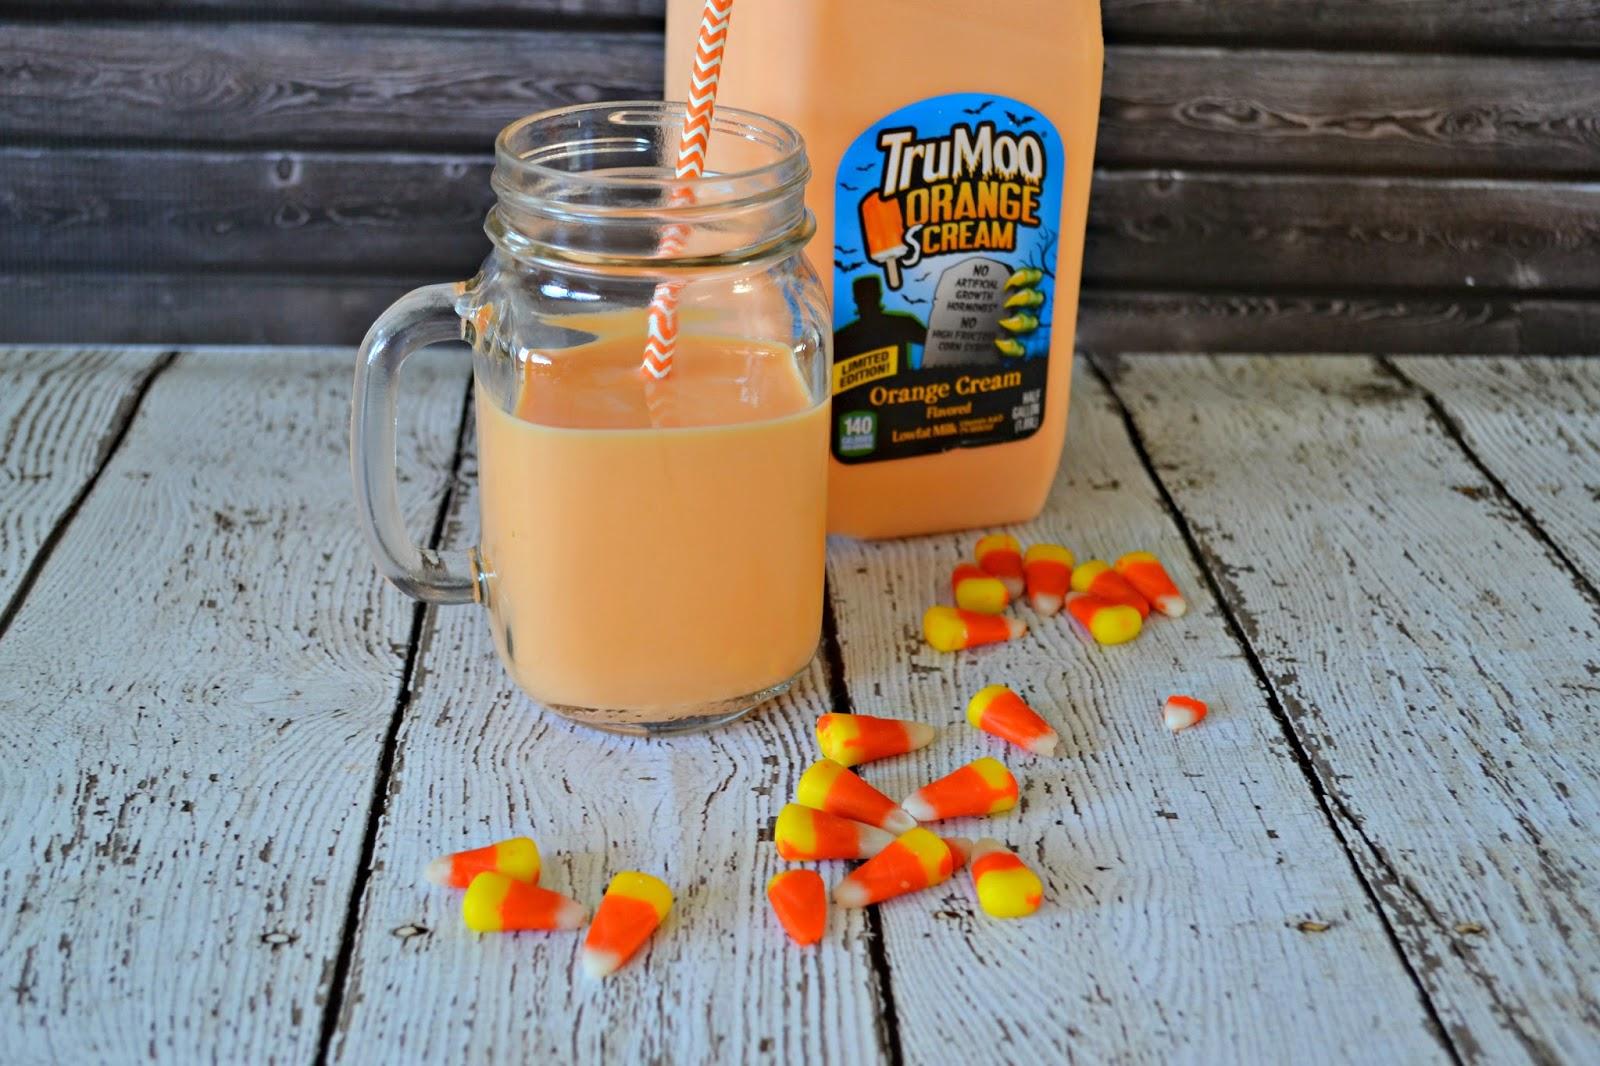 TruMoo Orange Scream Milk Shake #recipe TruMoo Milk Where to buy TruMoo Orange milk.  Orange milk recipes